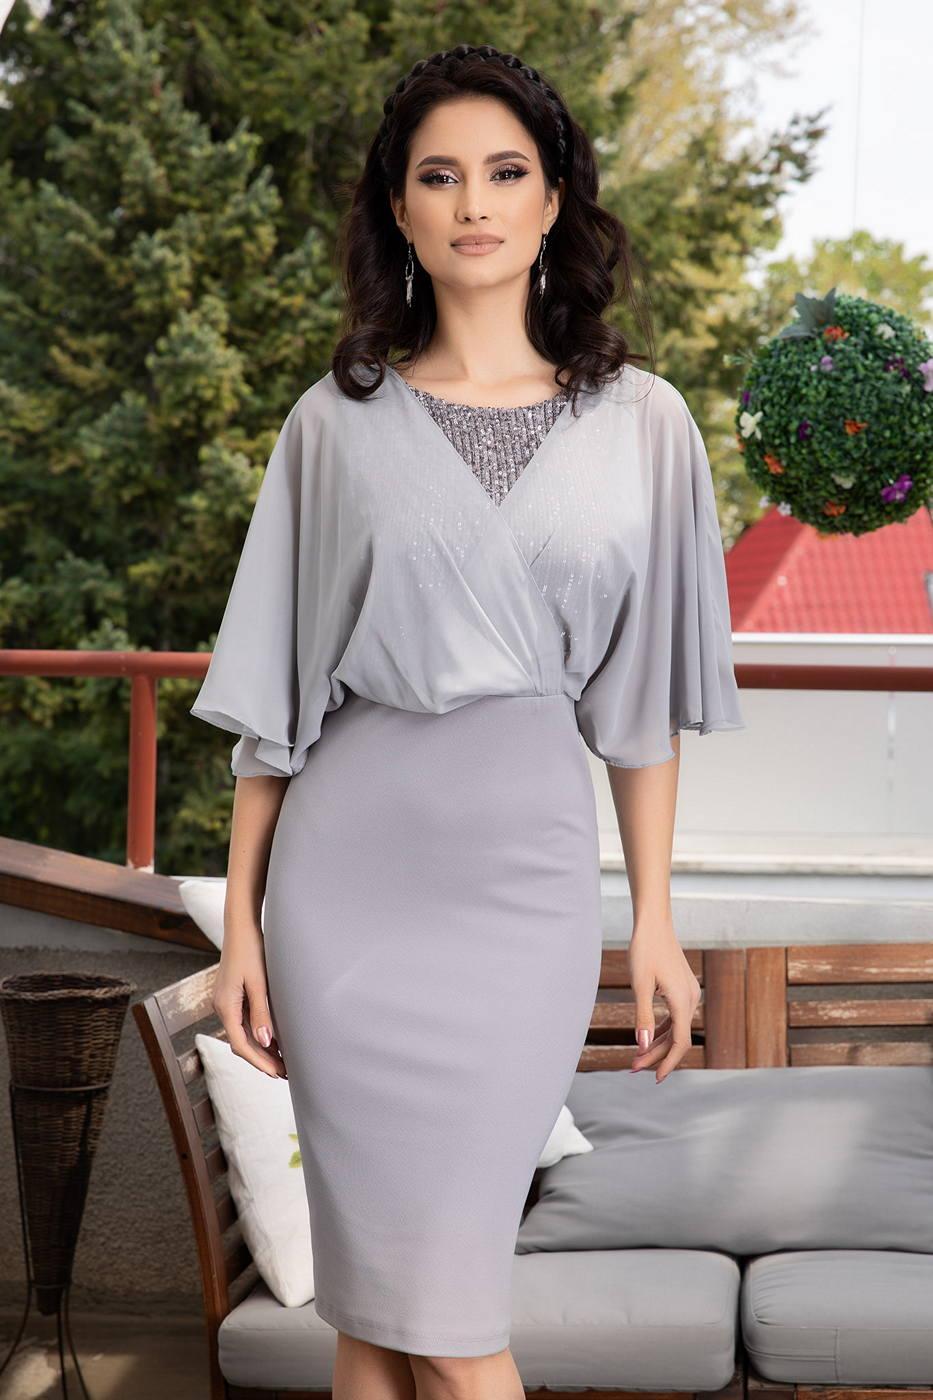 Camille Γκρι Φόρεμα 1457